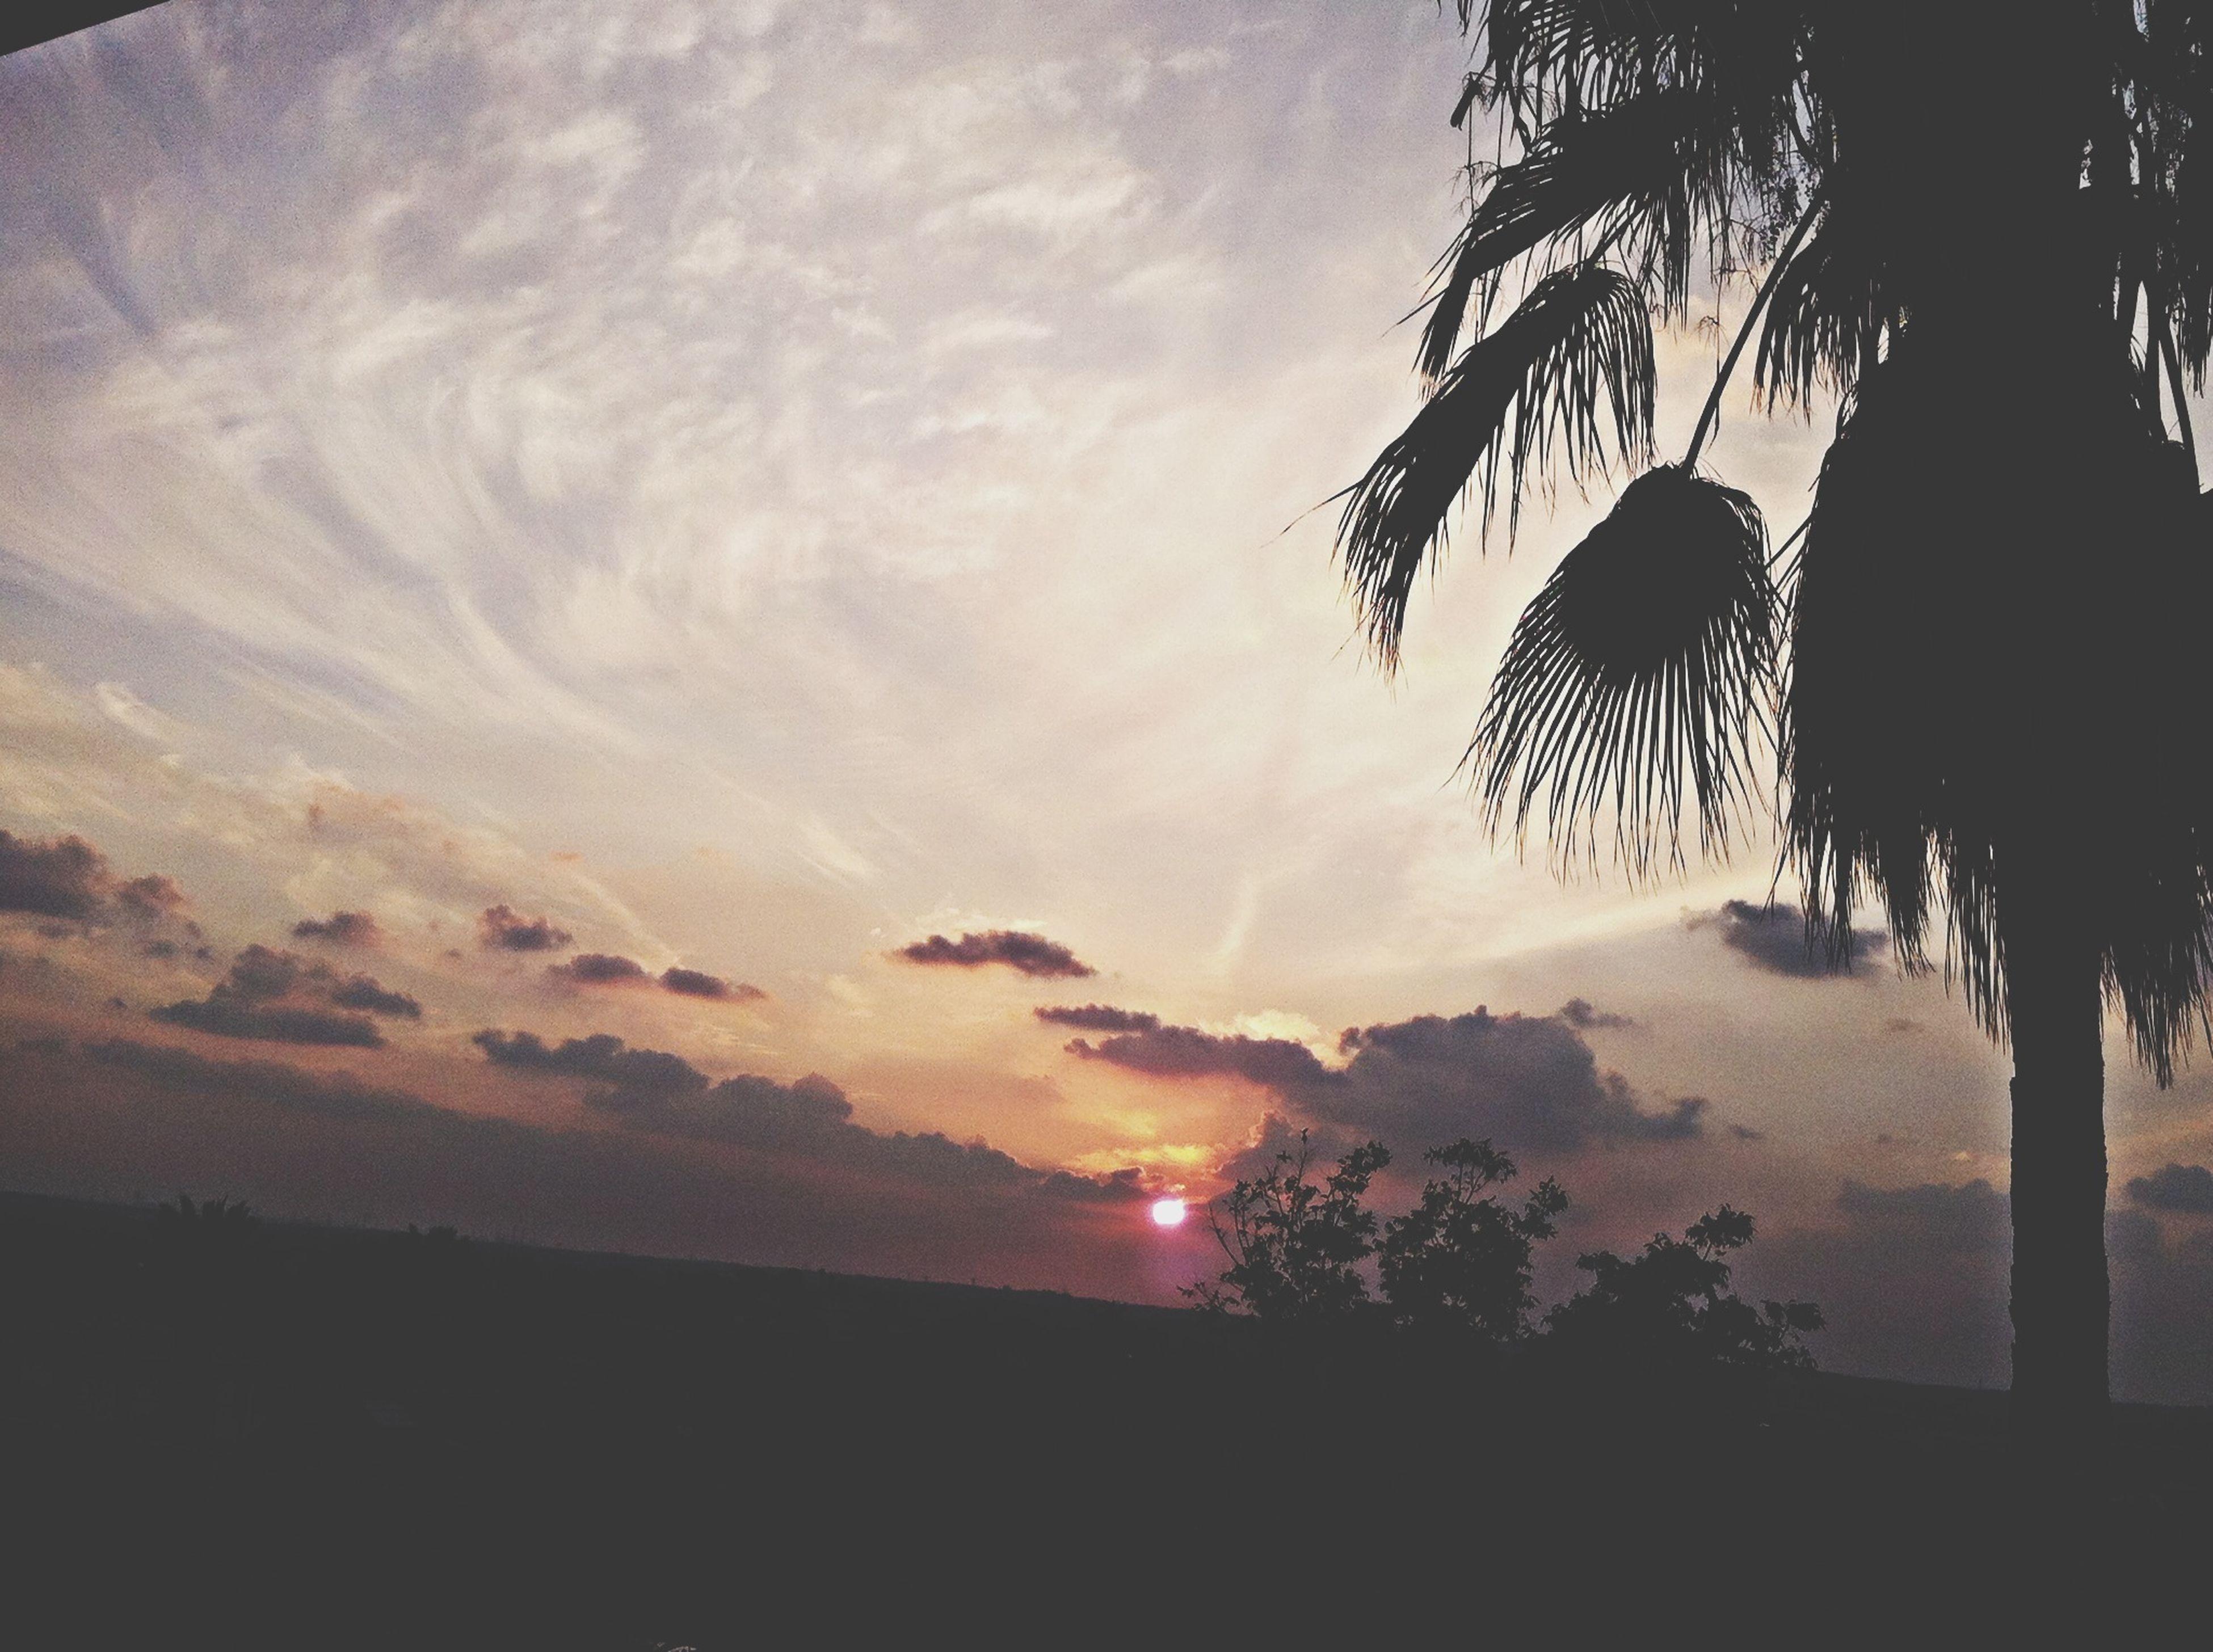 silhouette, sky, tree, tranquility, scenics, tranquil scene, beauty in nature, sunset, cloud - sky, nature, idyllic, sun, palm tree, cloud, outdoors, cloudy, sunlight, dusk, sunbeam, no people